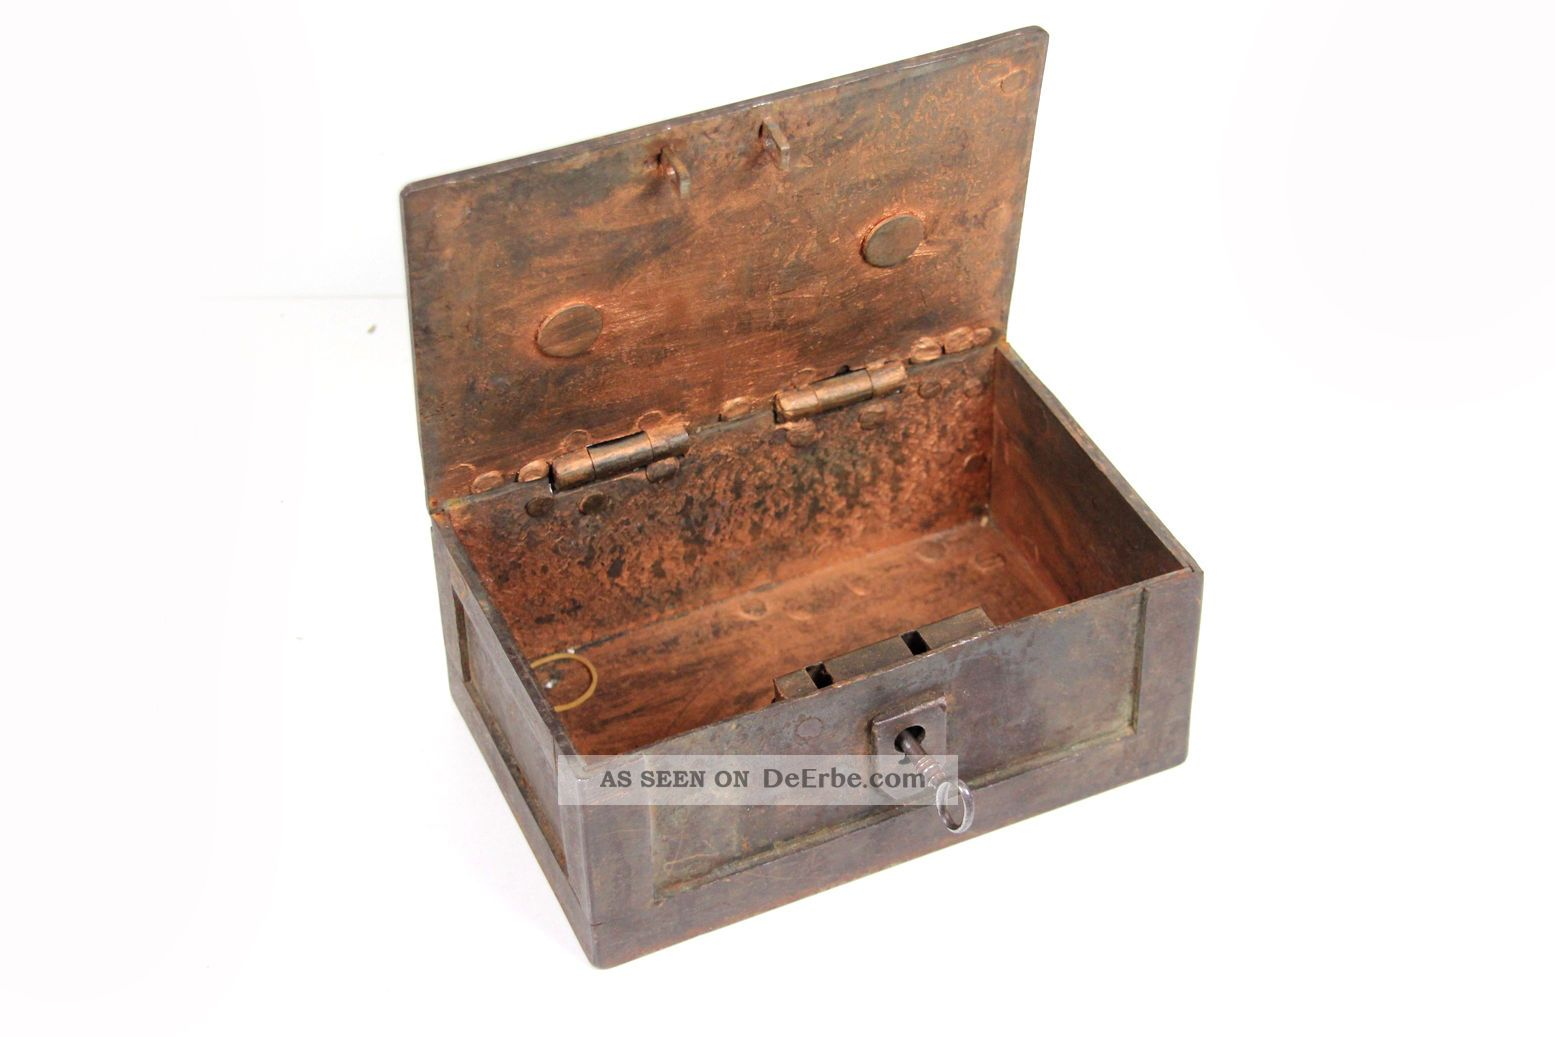 Antike Metall - Geldkassette 20x9,  5x13 Cm Geldkasse Münzkassette Kupfer Kassette Kaufleute & Krämer Bild